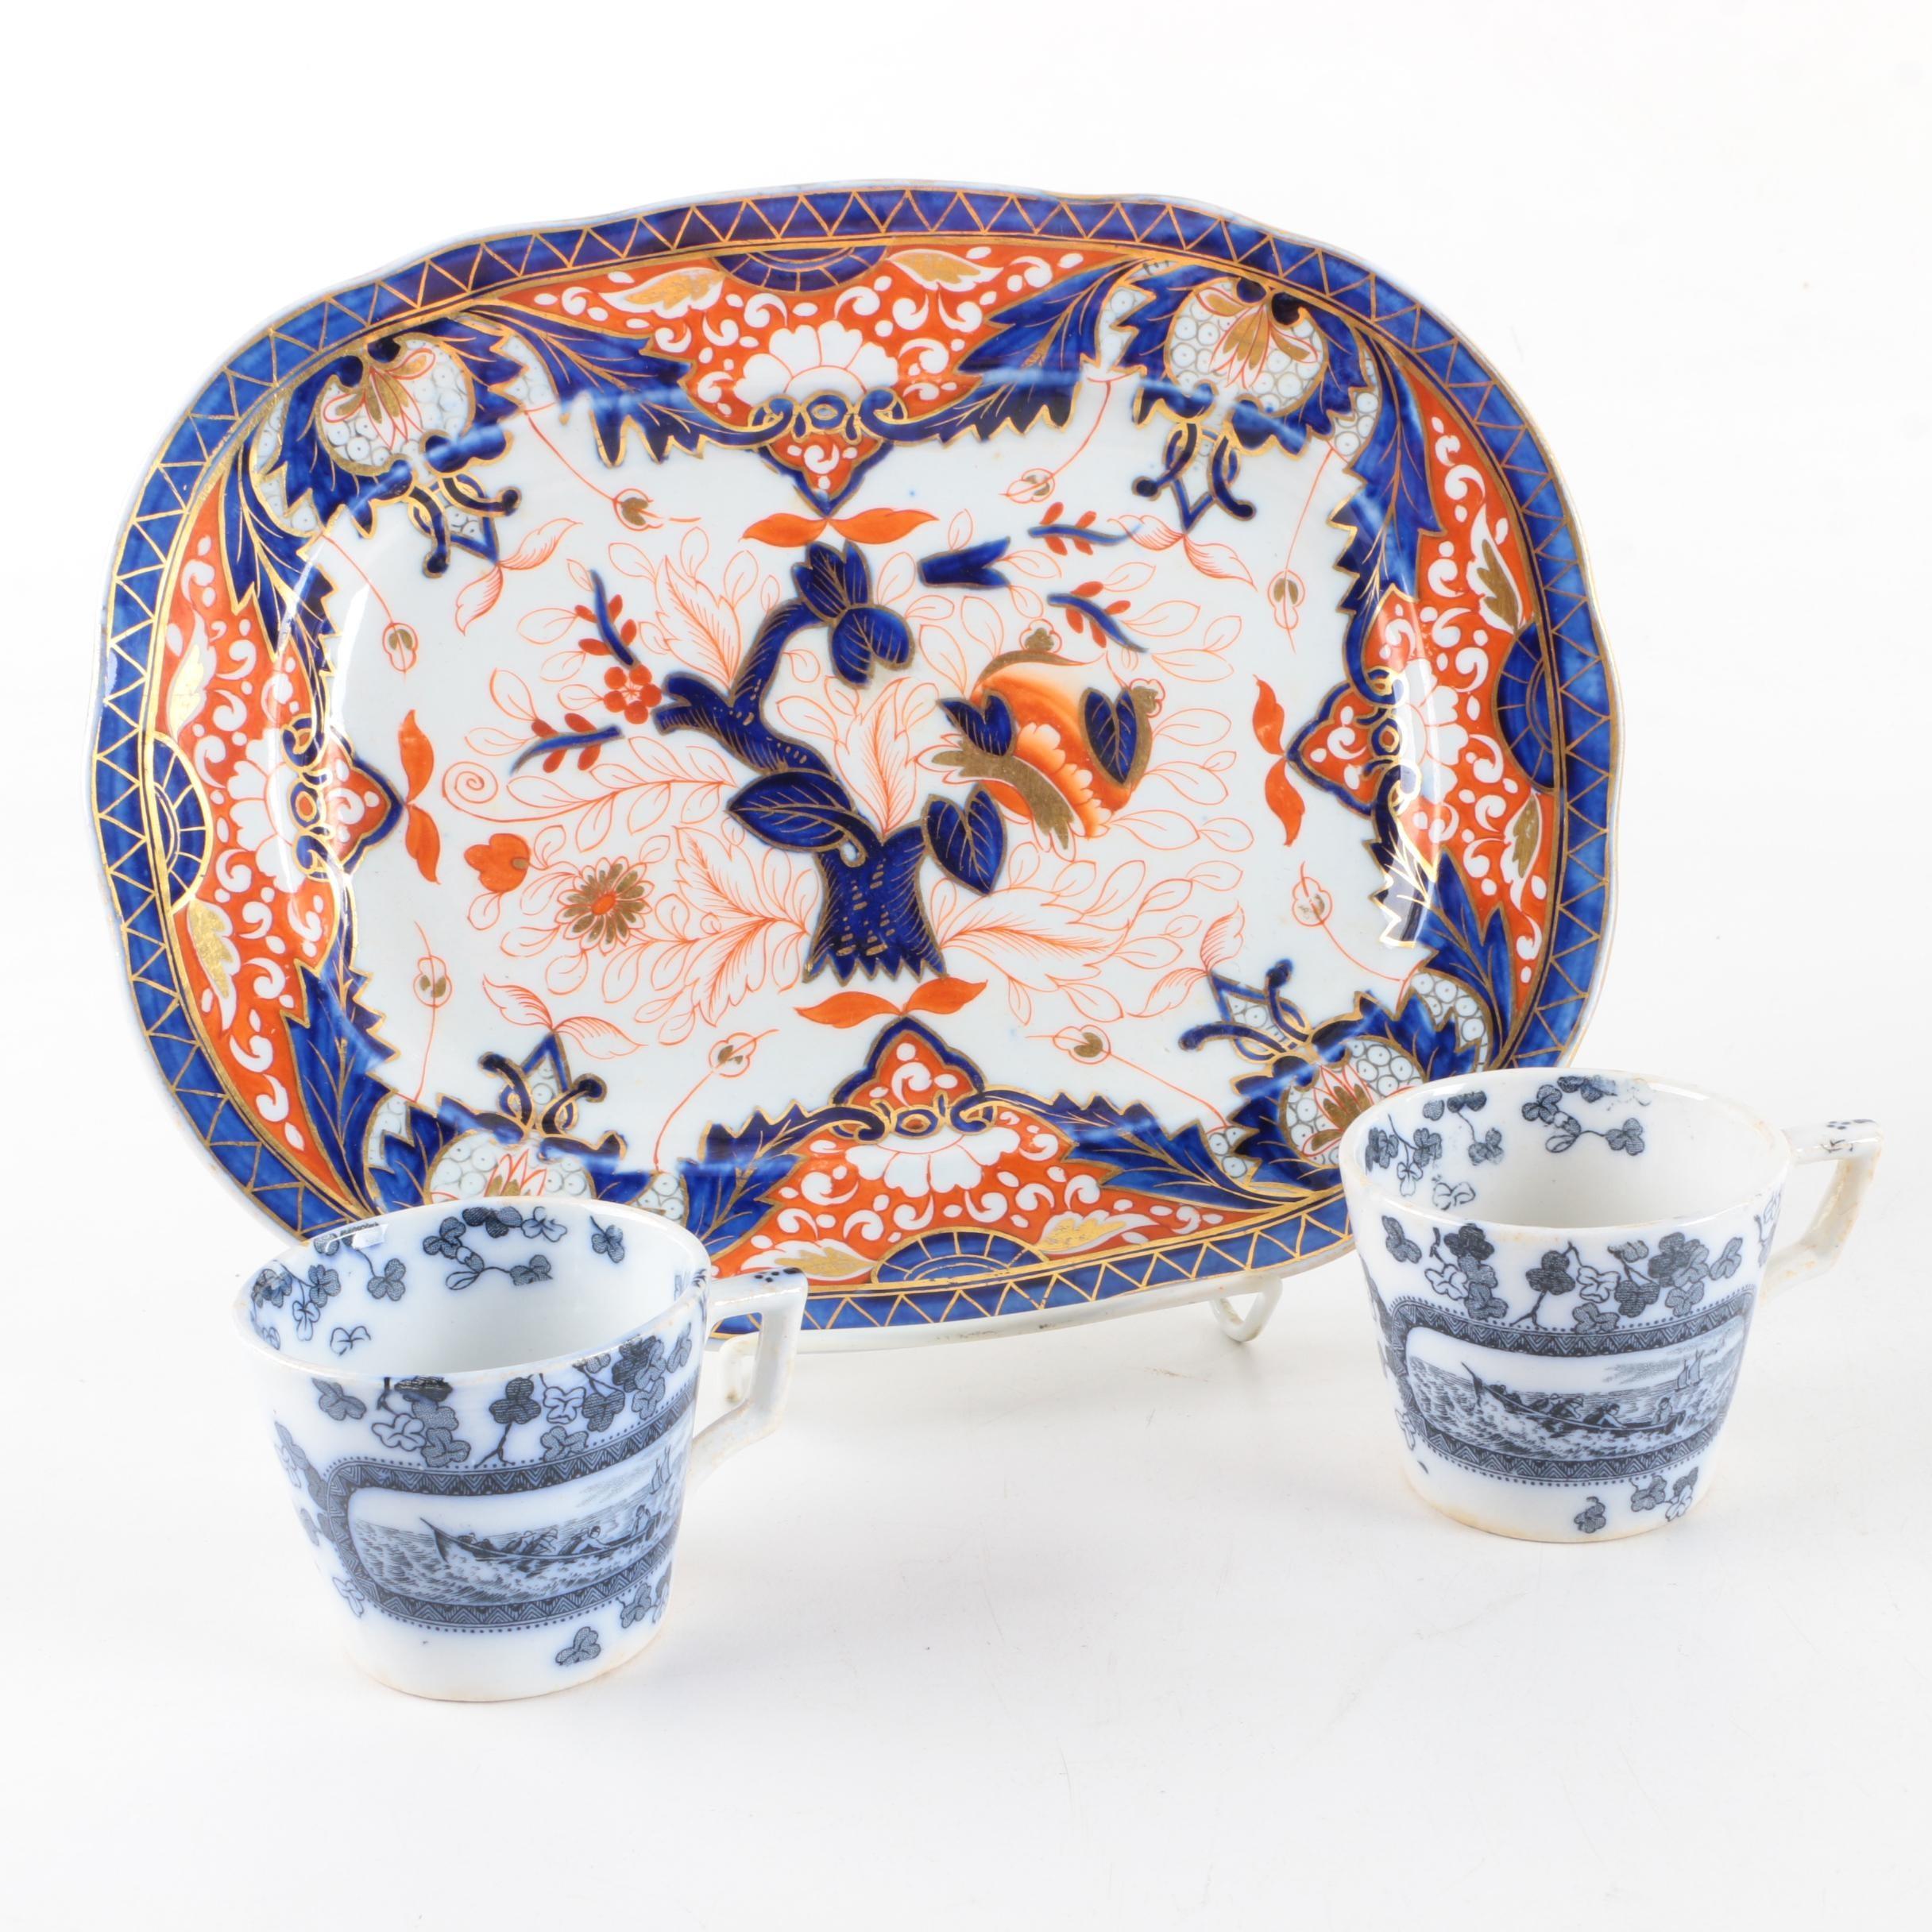 Antique English Tableware Including Imari Style Tray